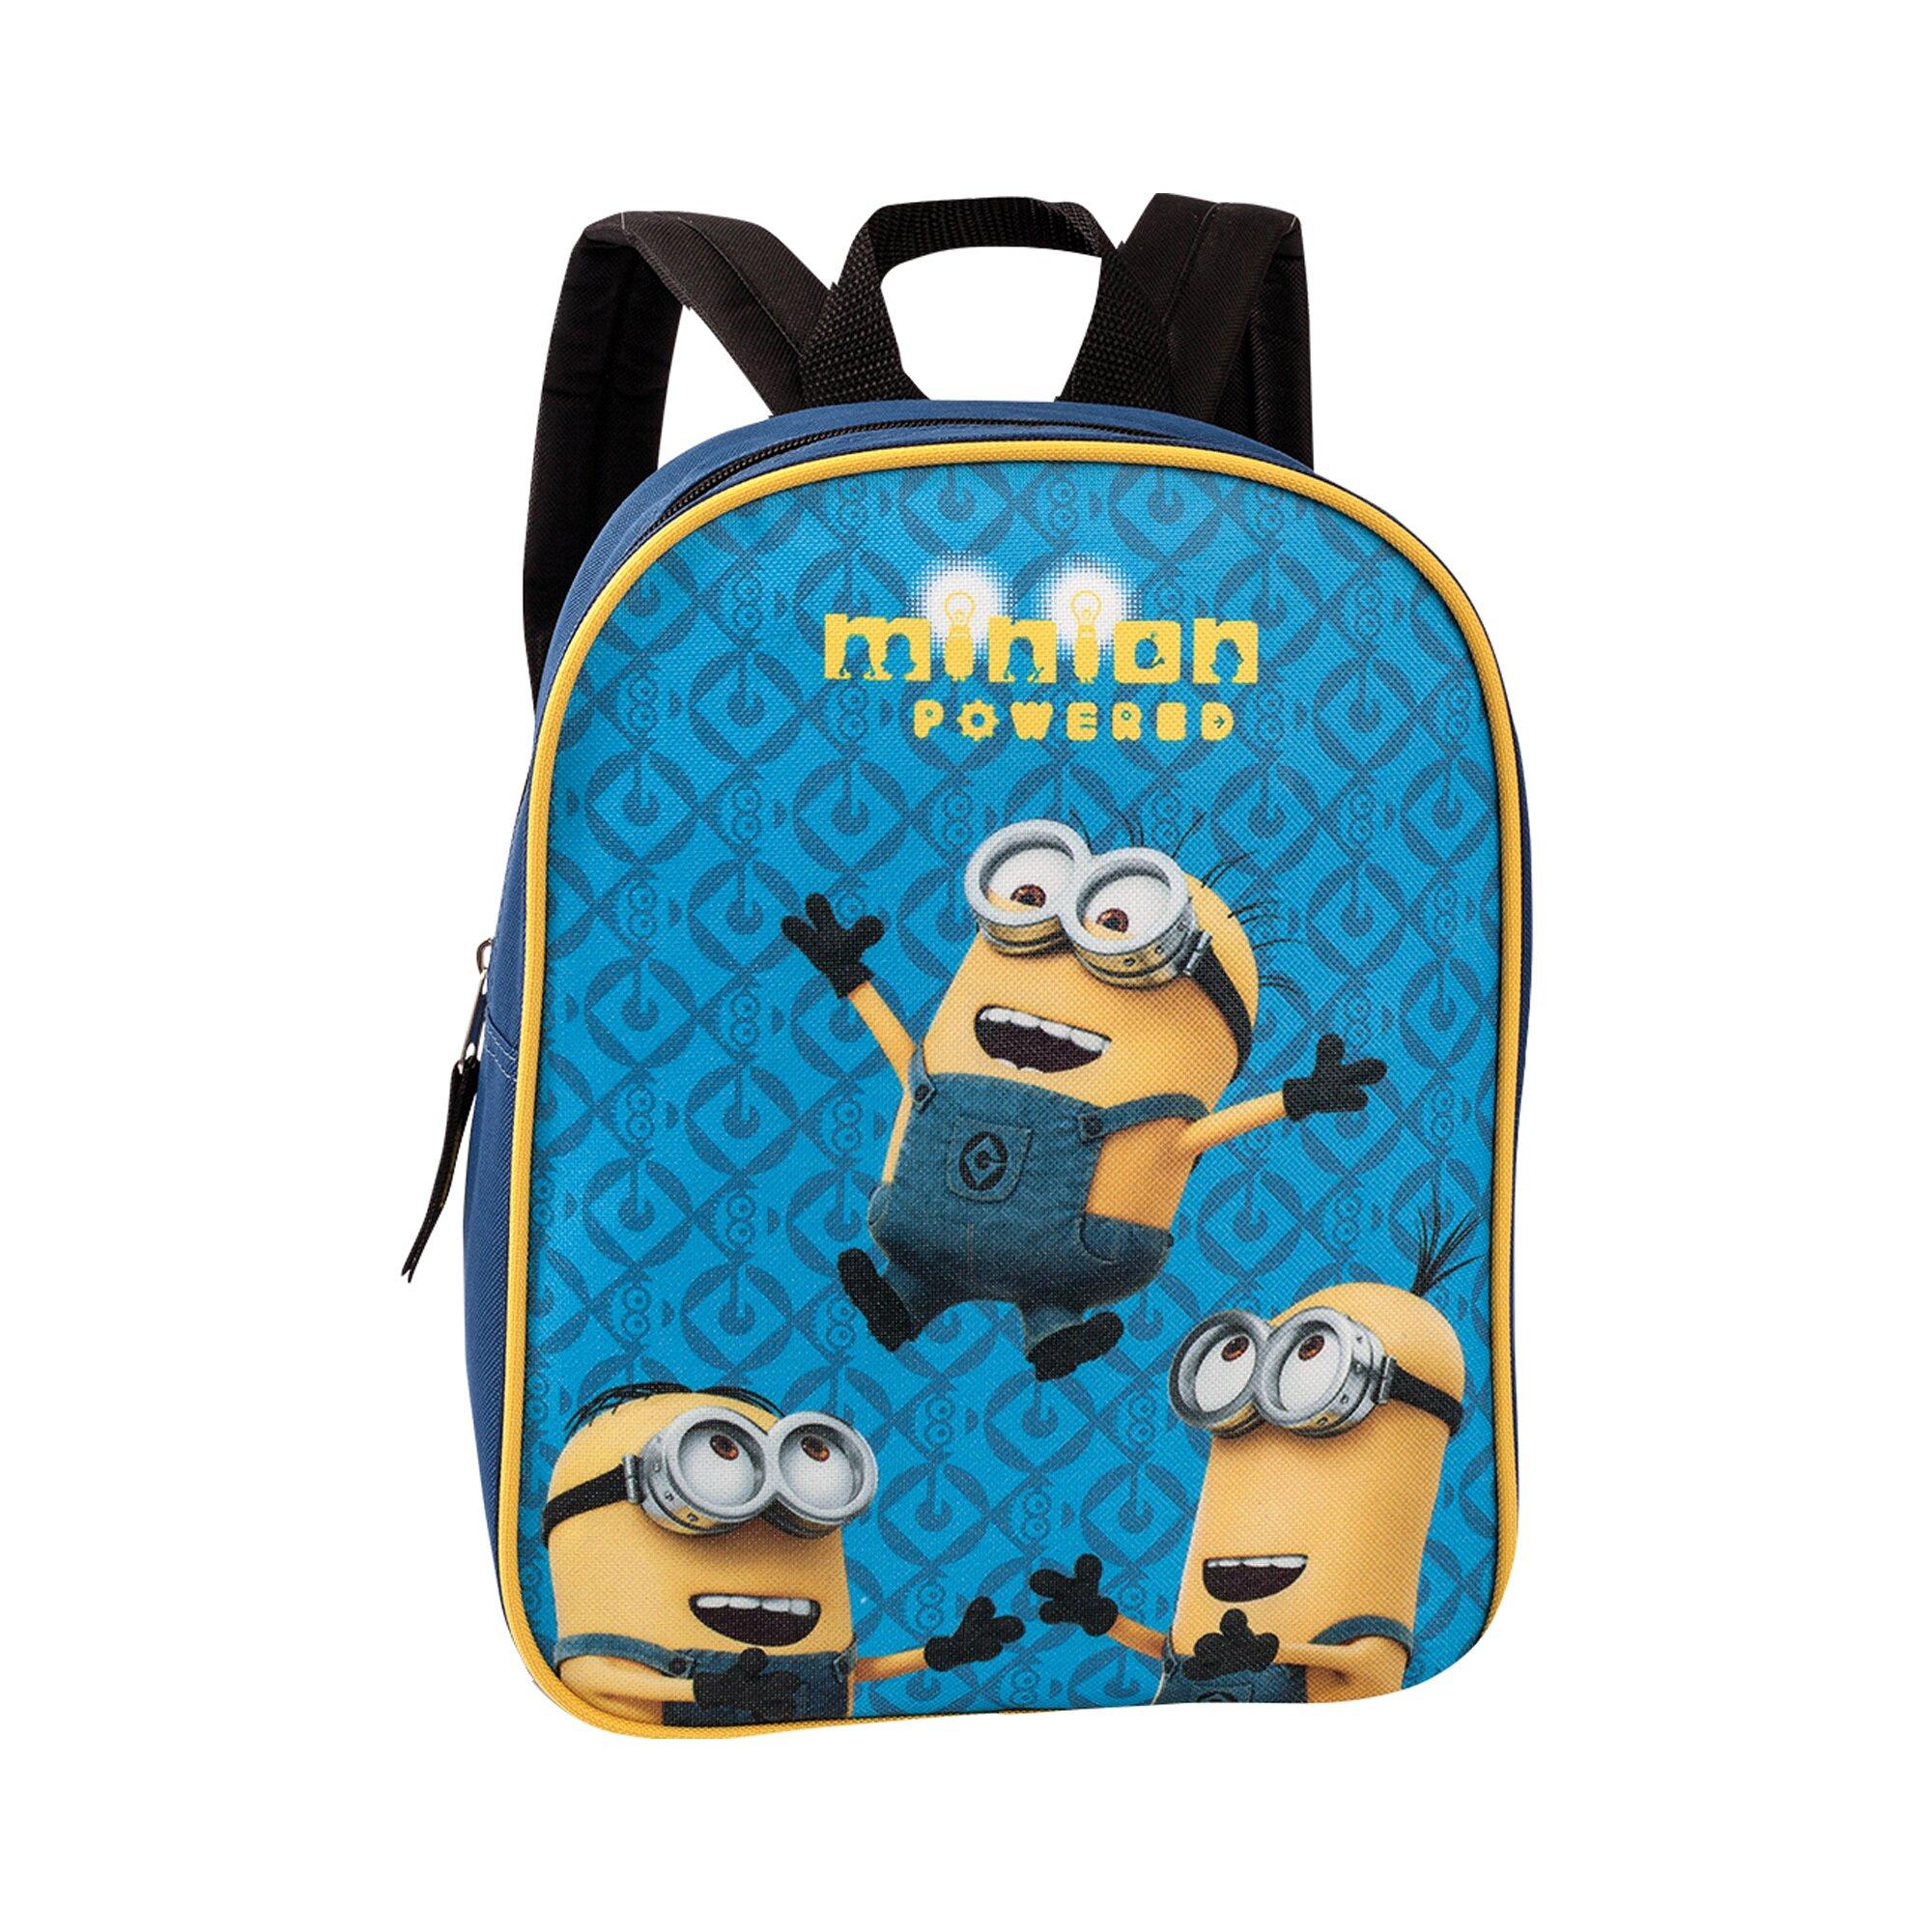 Minions Kindergartenrucksack